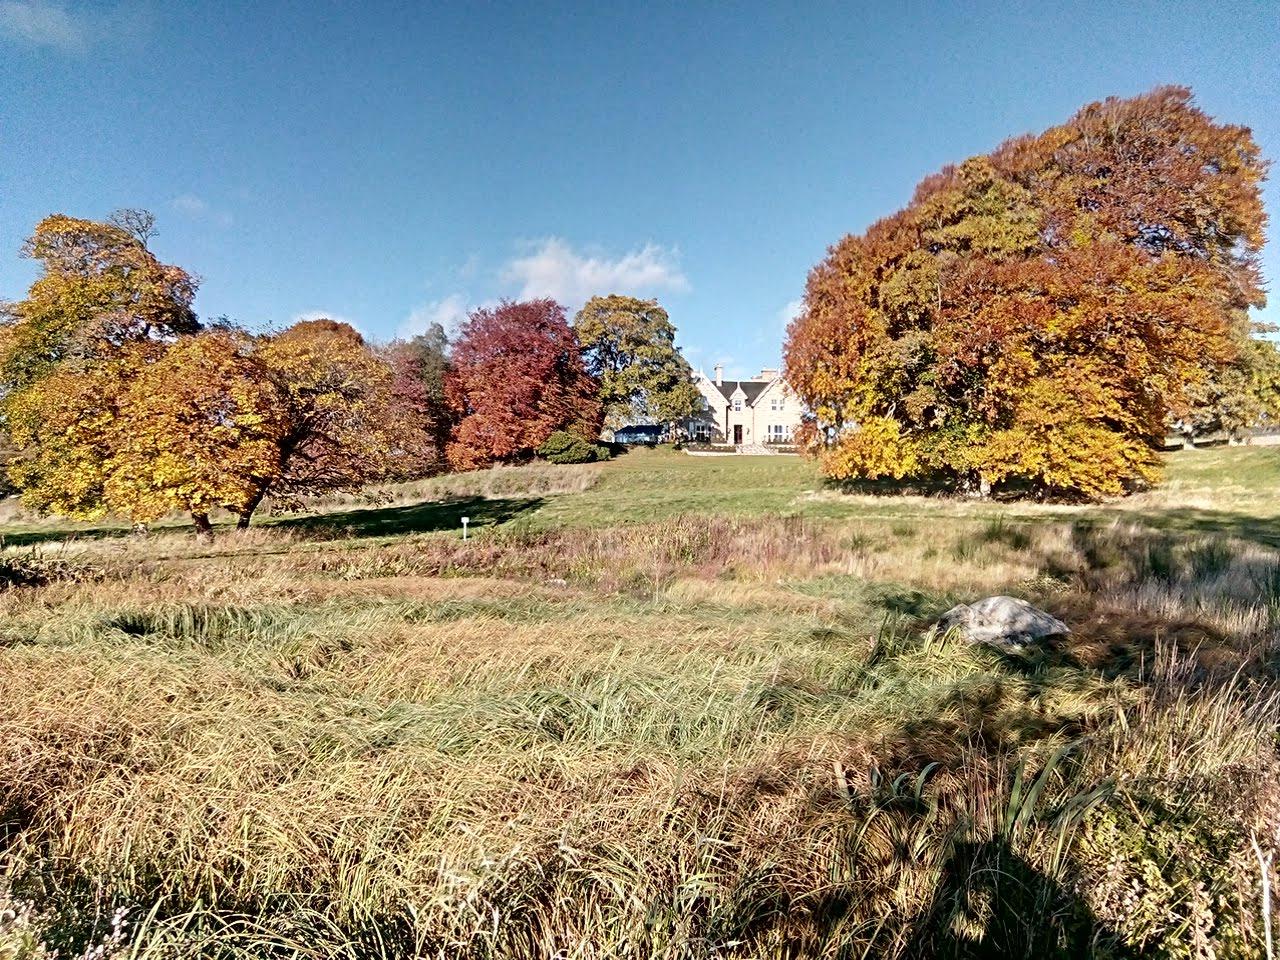 Autumn at Muckrach